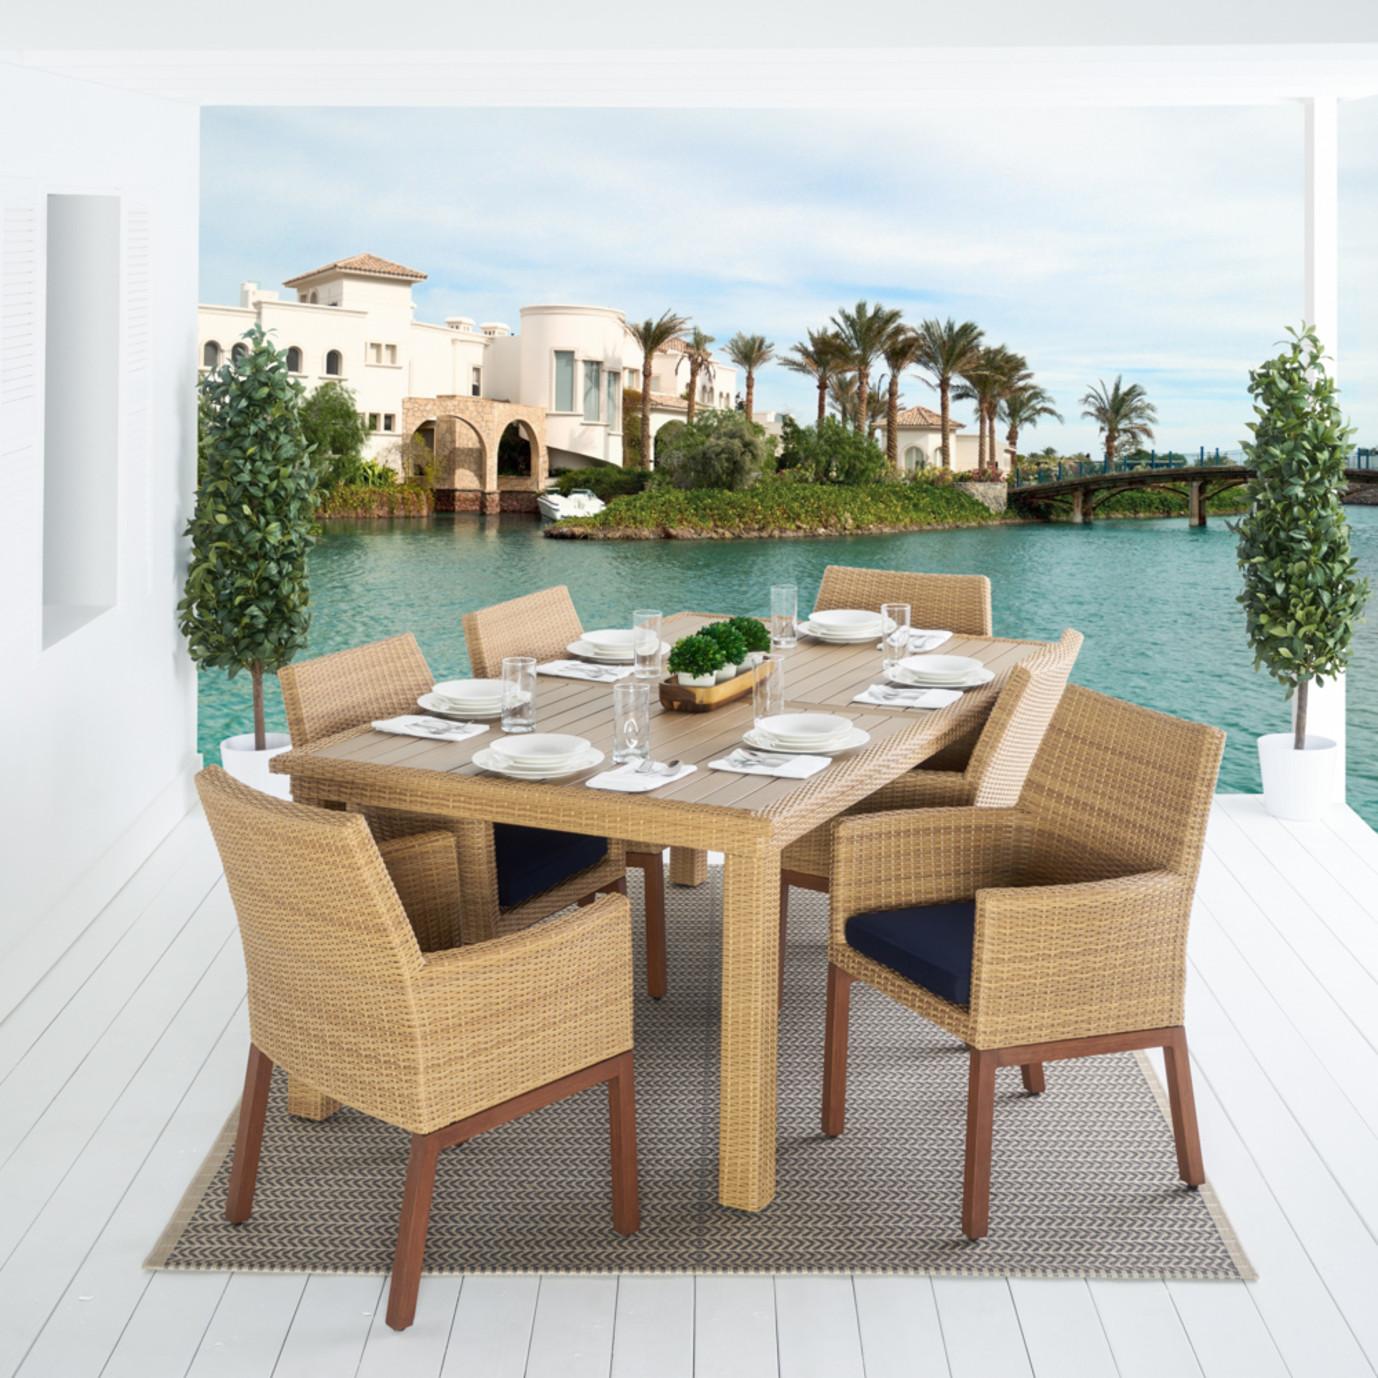 Mili™ 7 Piece Dining Set - Navy Blue